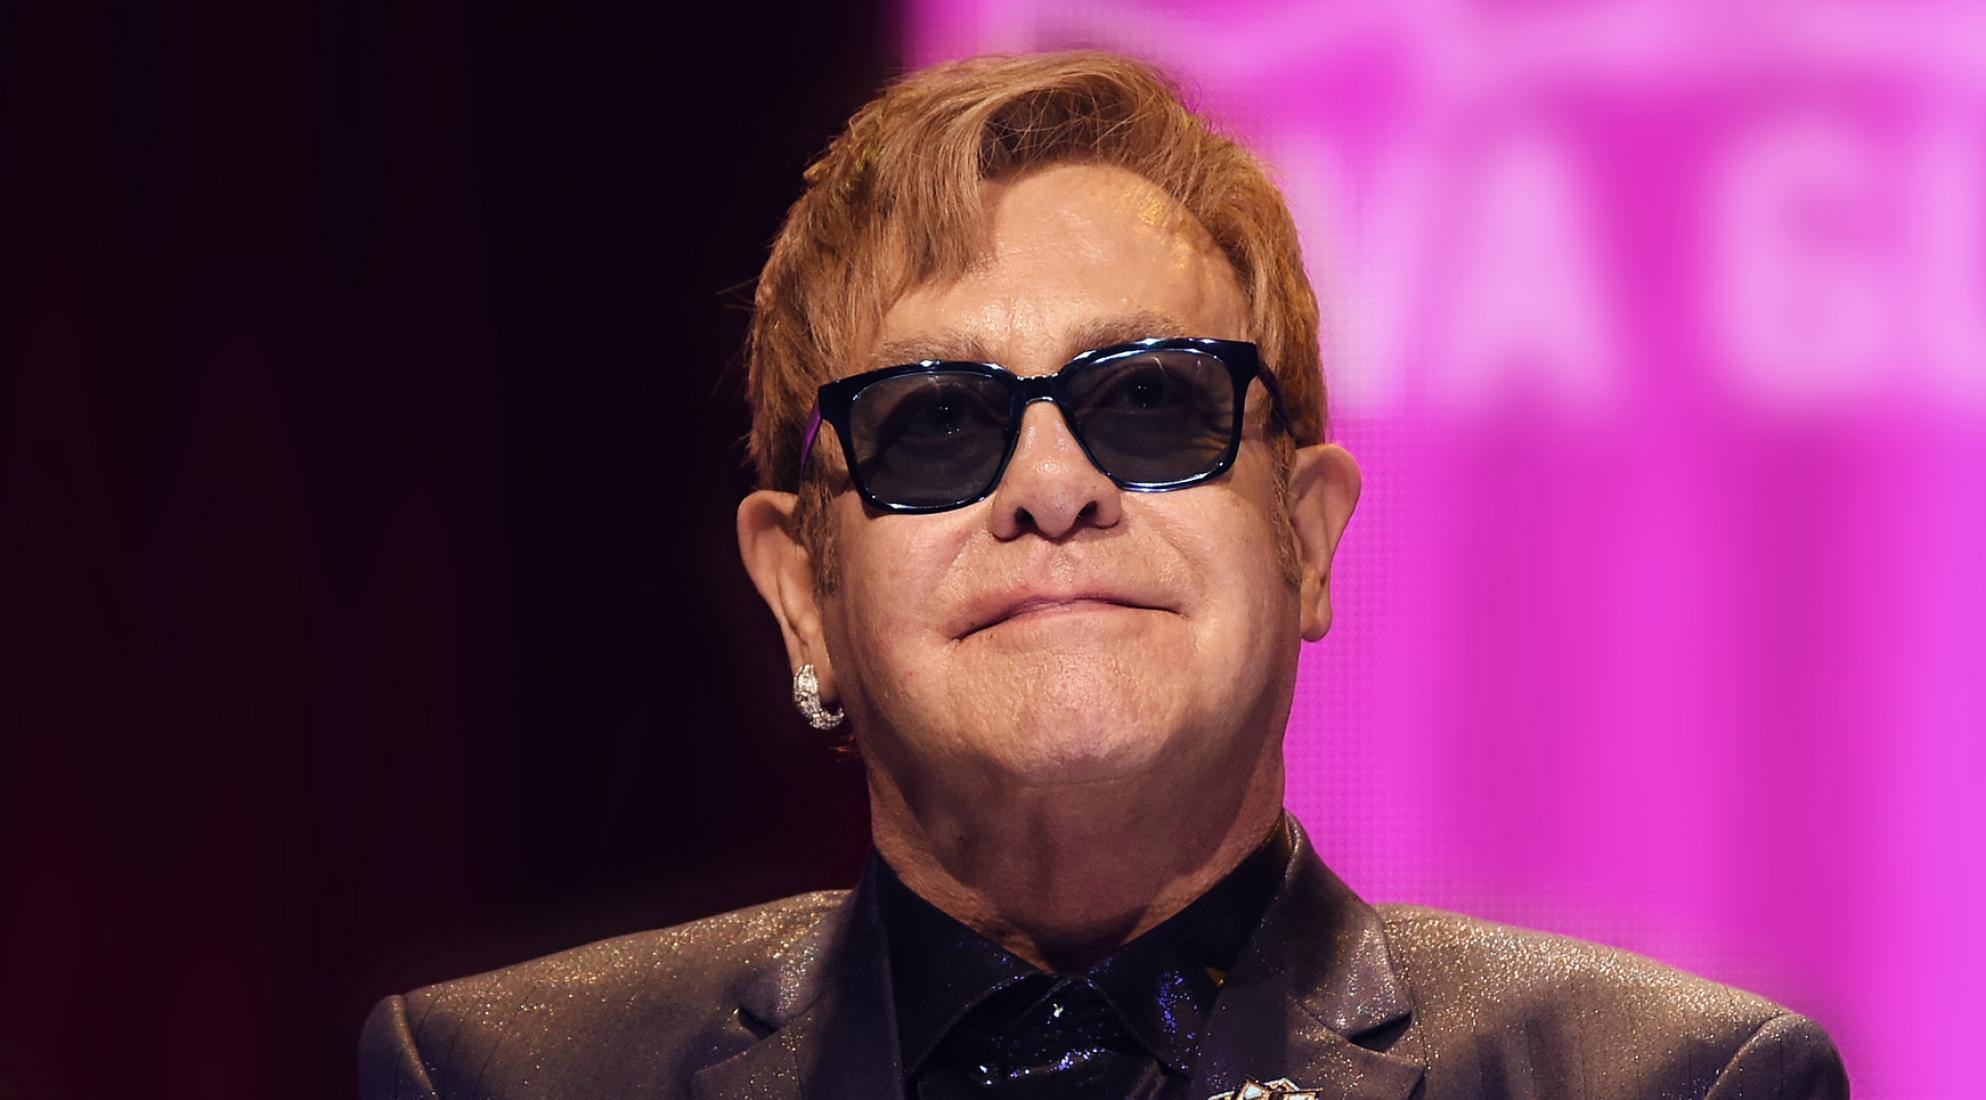 Elton John, Rocket Man, Biopic, prima, anteprima, video, Stone Music, Classic Rock